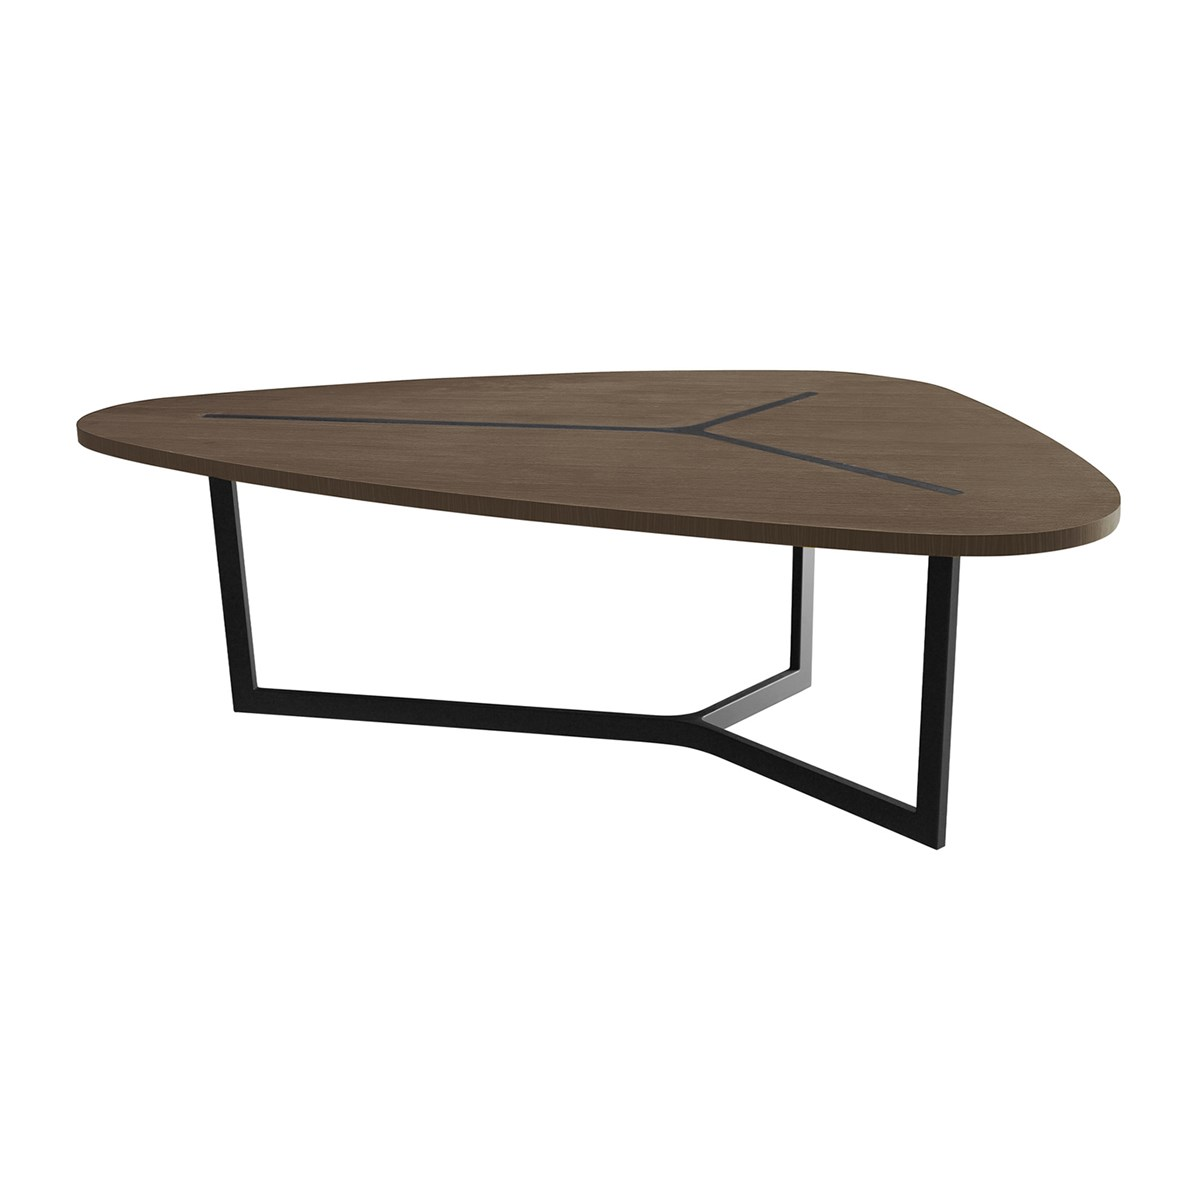 B&B-Italia-Jean-Marie-Massaud-Seven-Table-Matisse-1